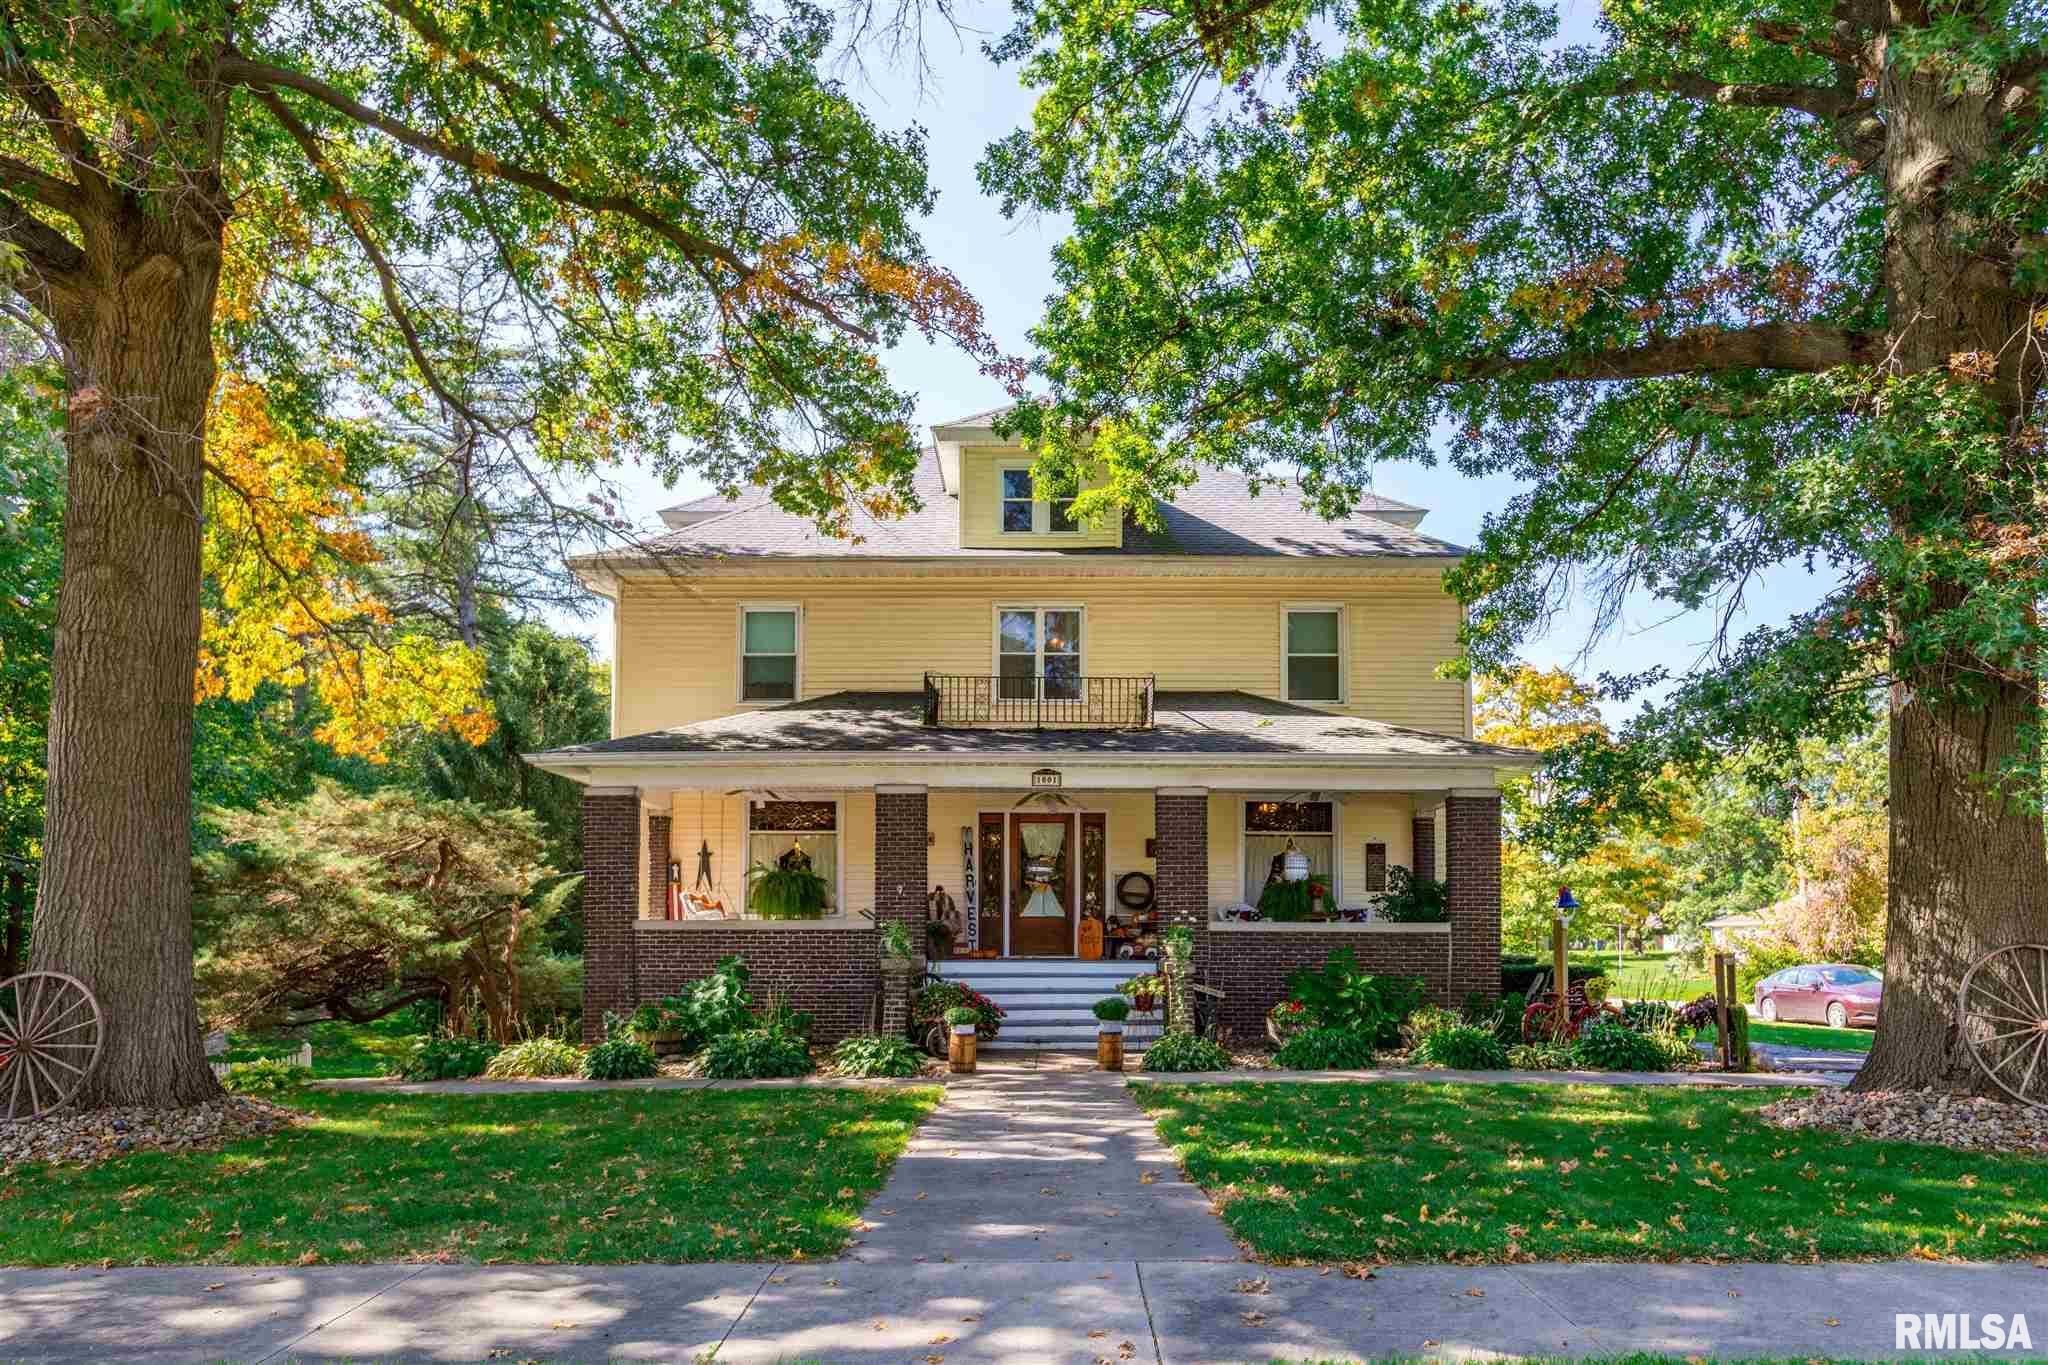 1001 S COLLEGE Property Photo - Aledo, IL real estate listing